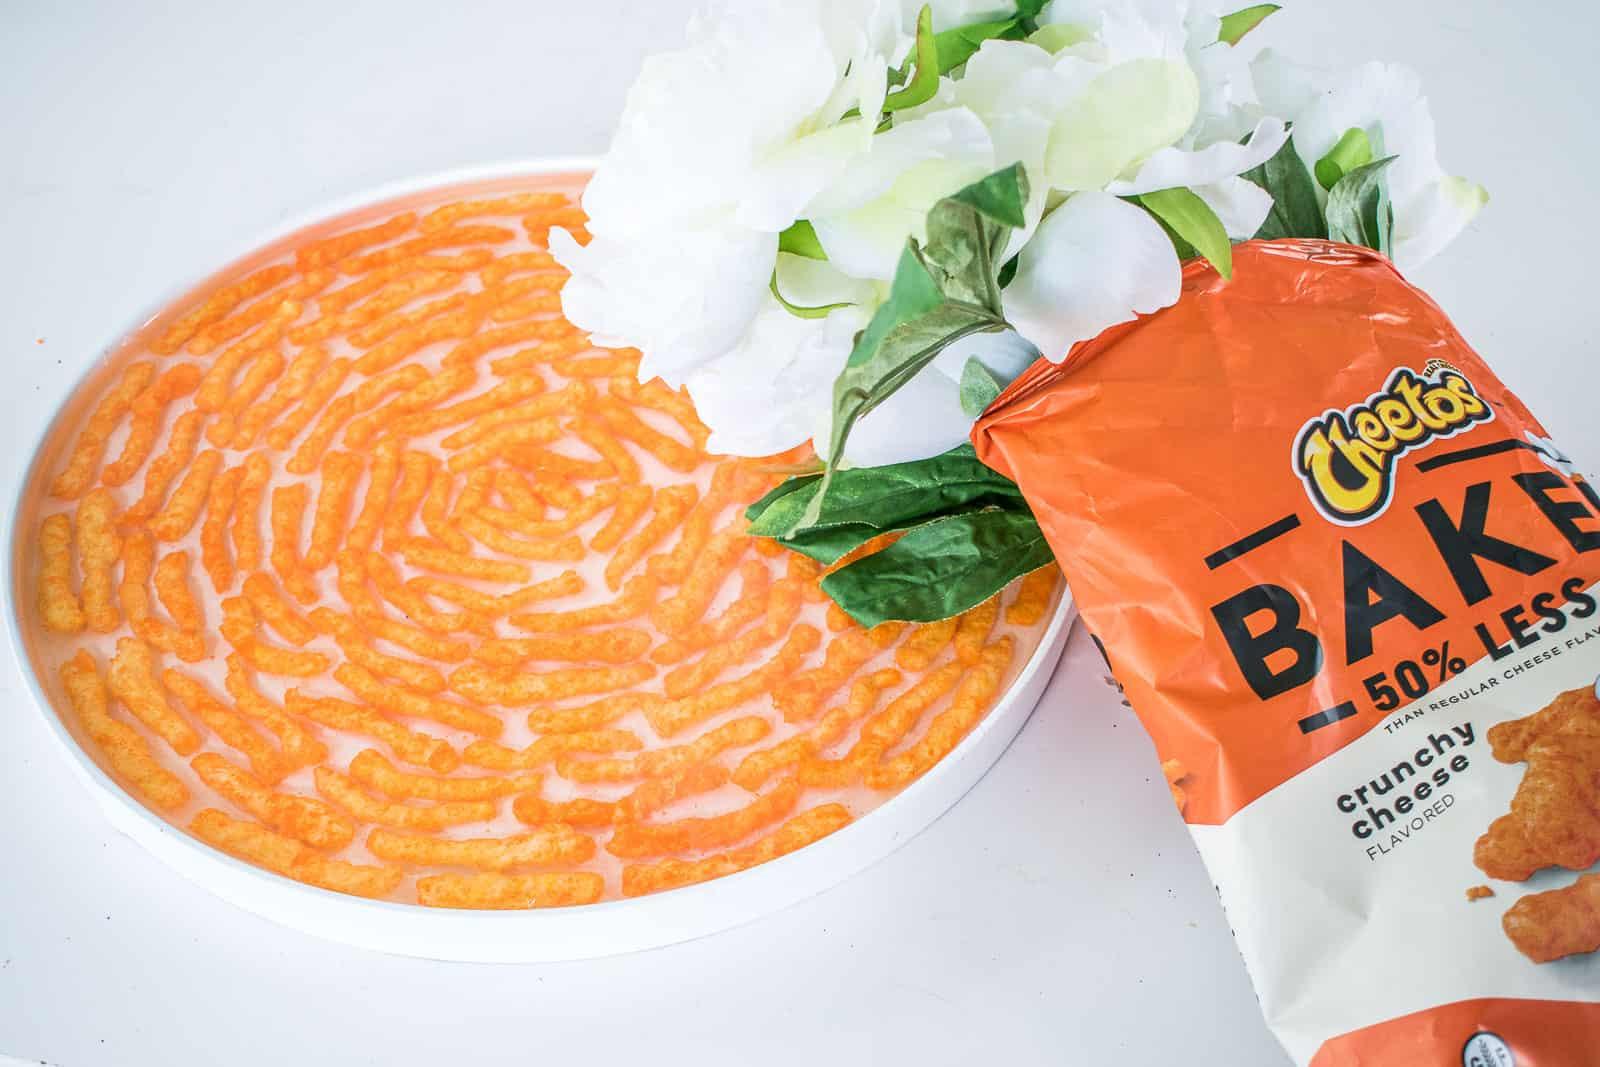 Cheetos epoxy tray